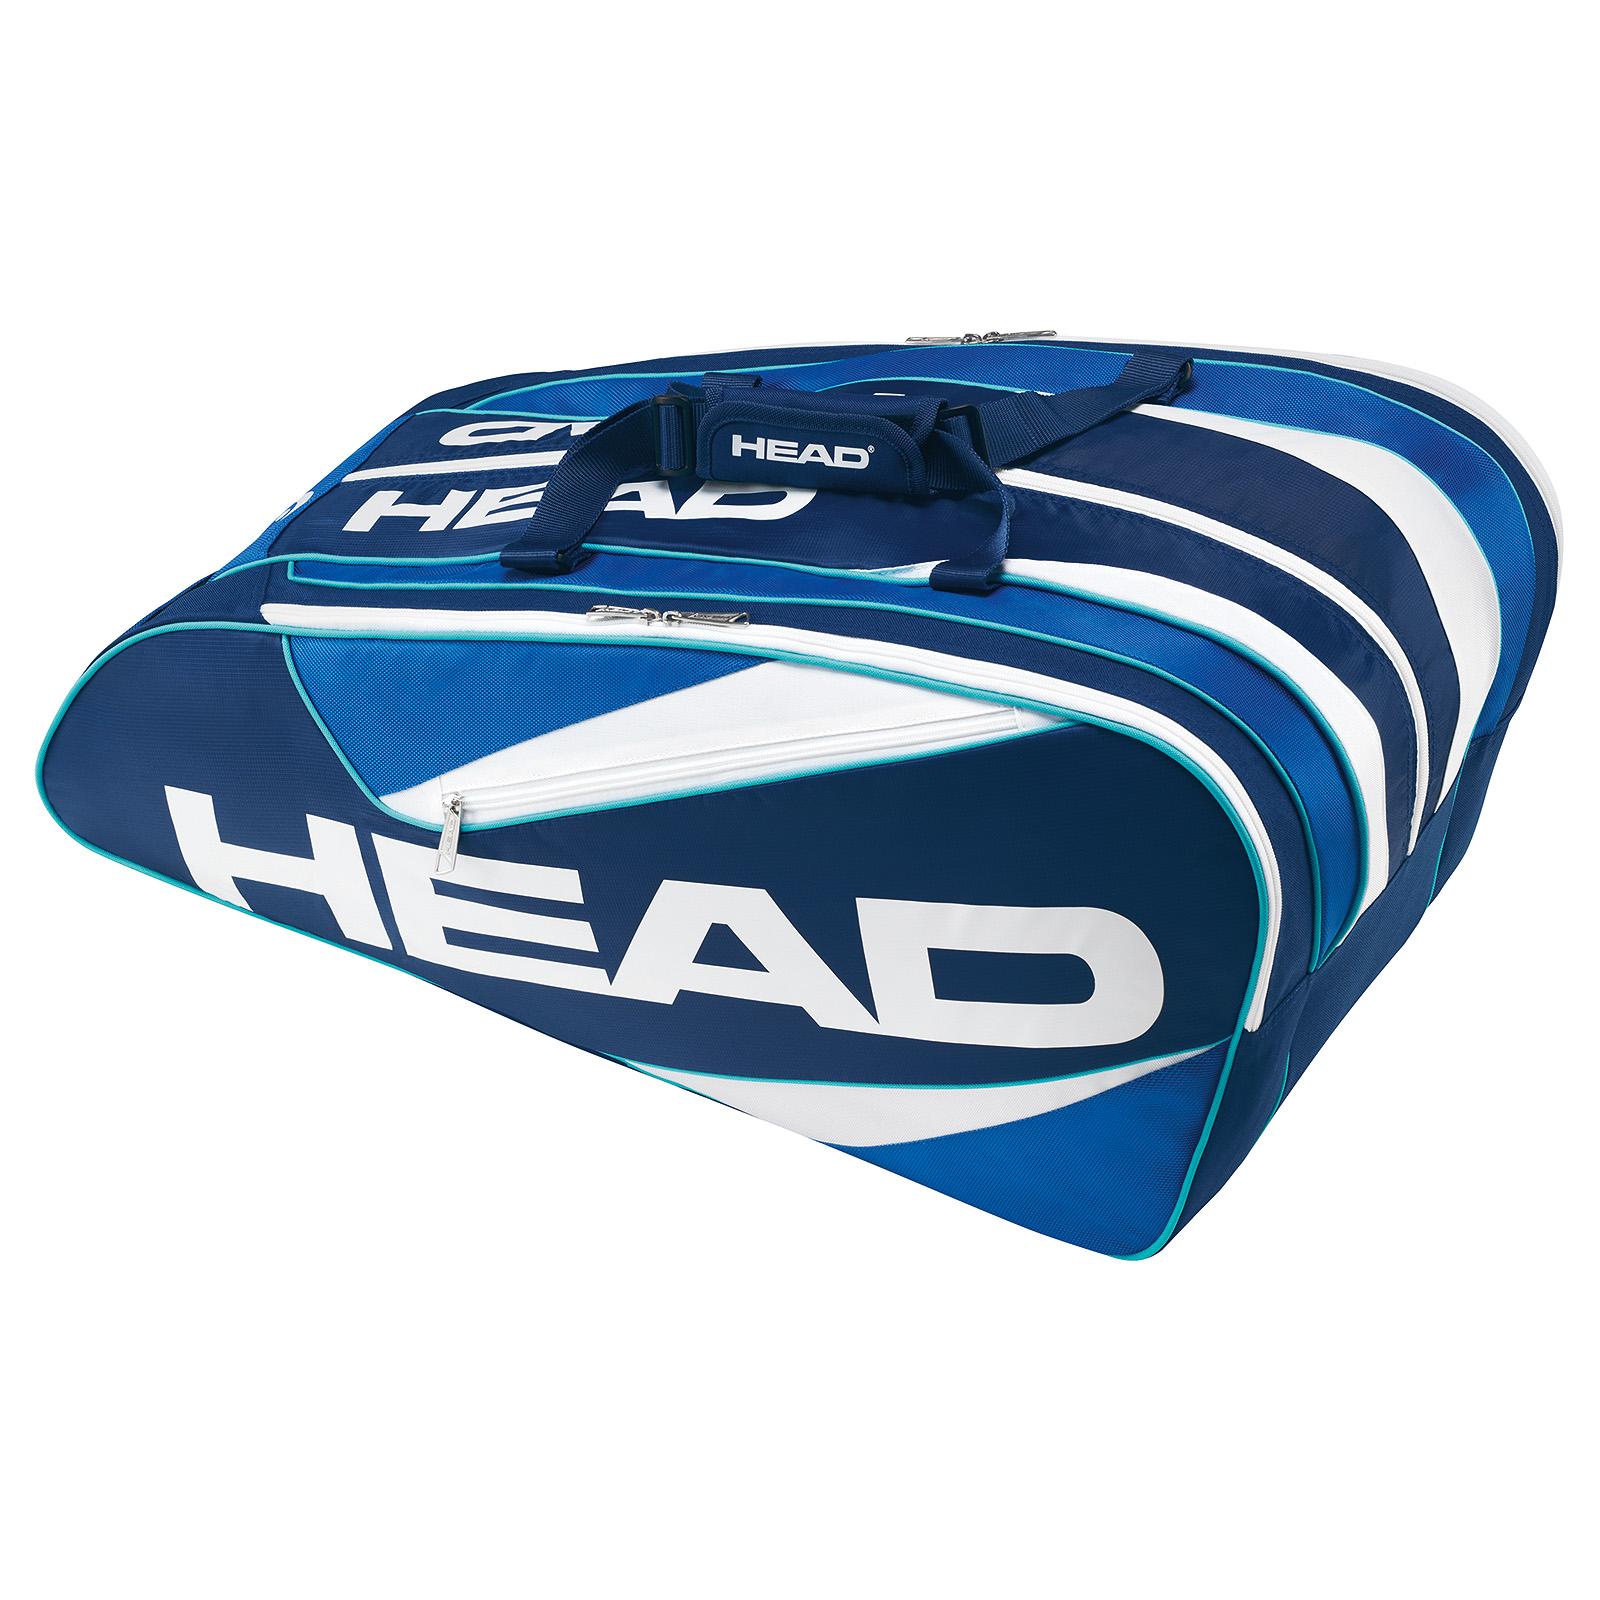 HEAD Elite Monstercombi 12R Blue